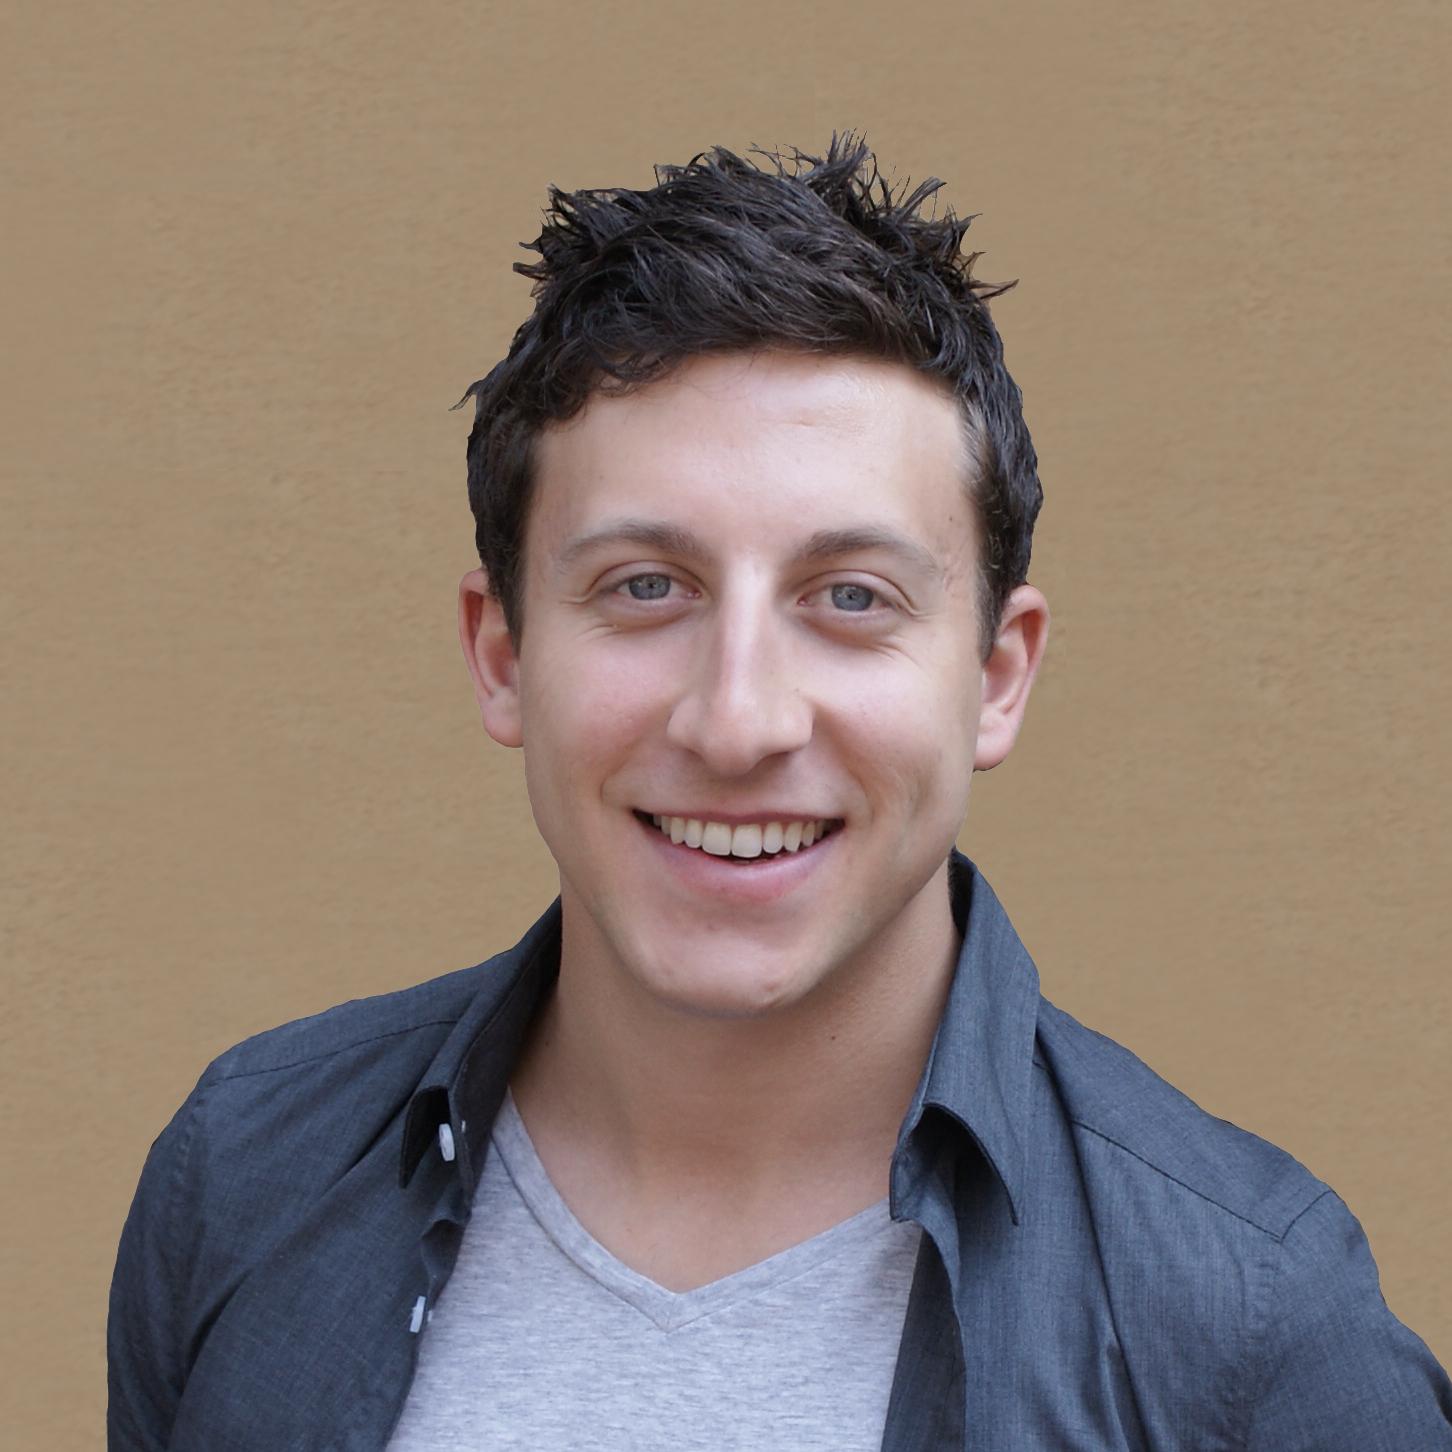 Matt Gontovnick